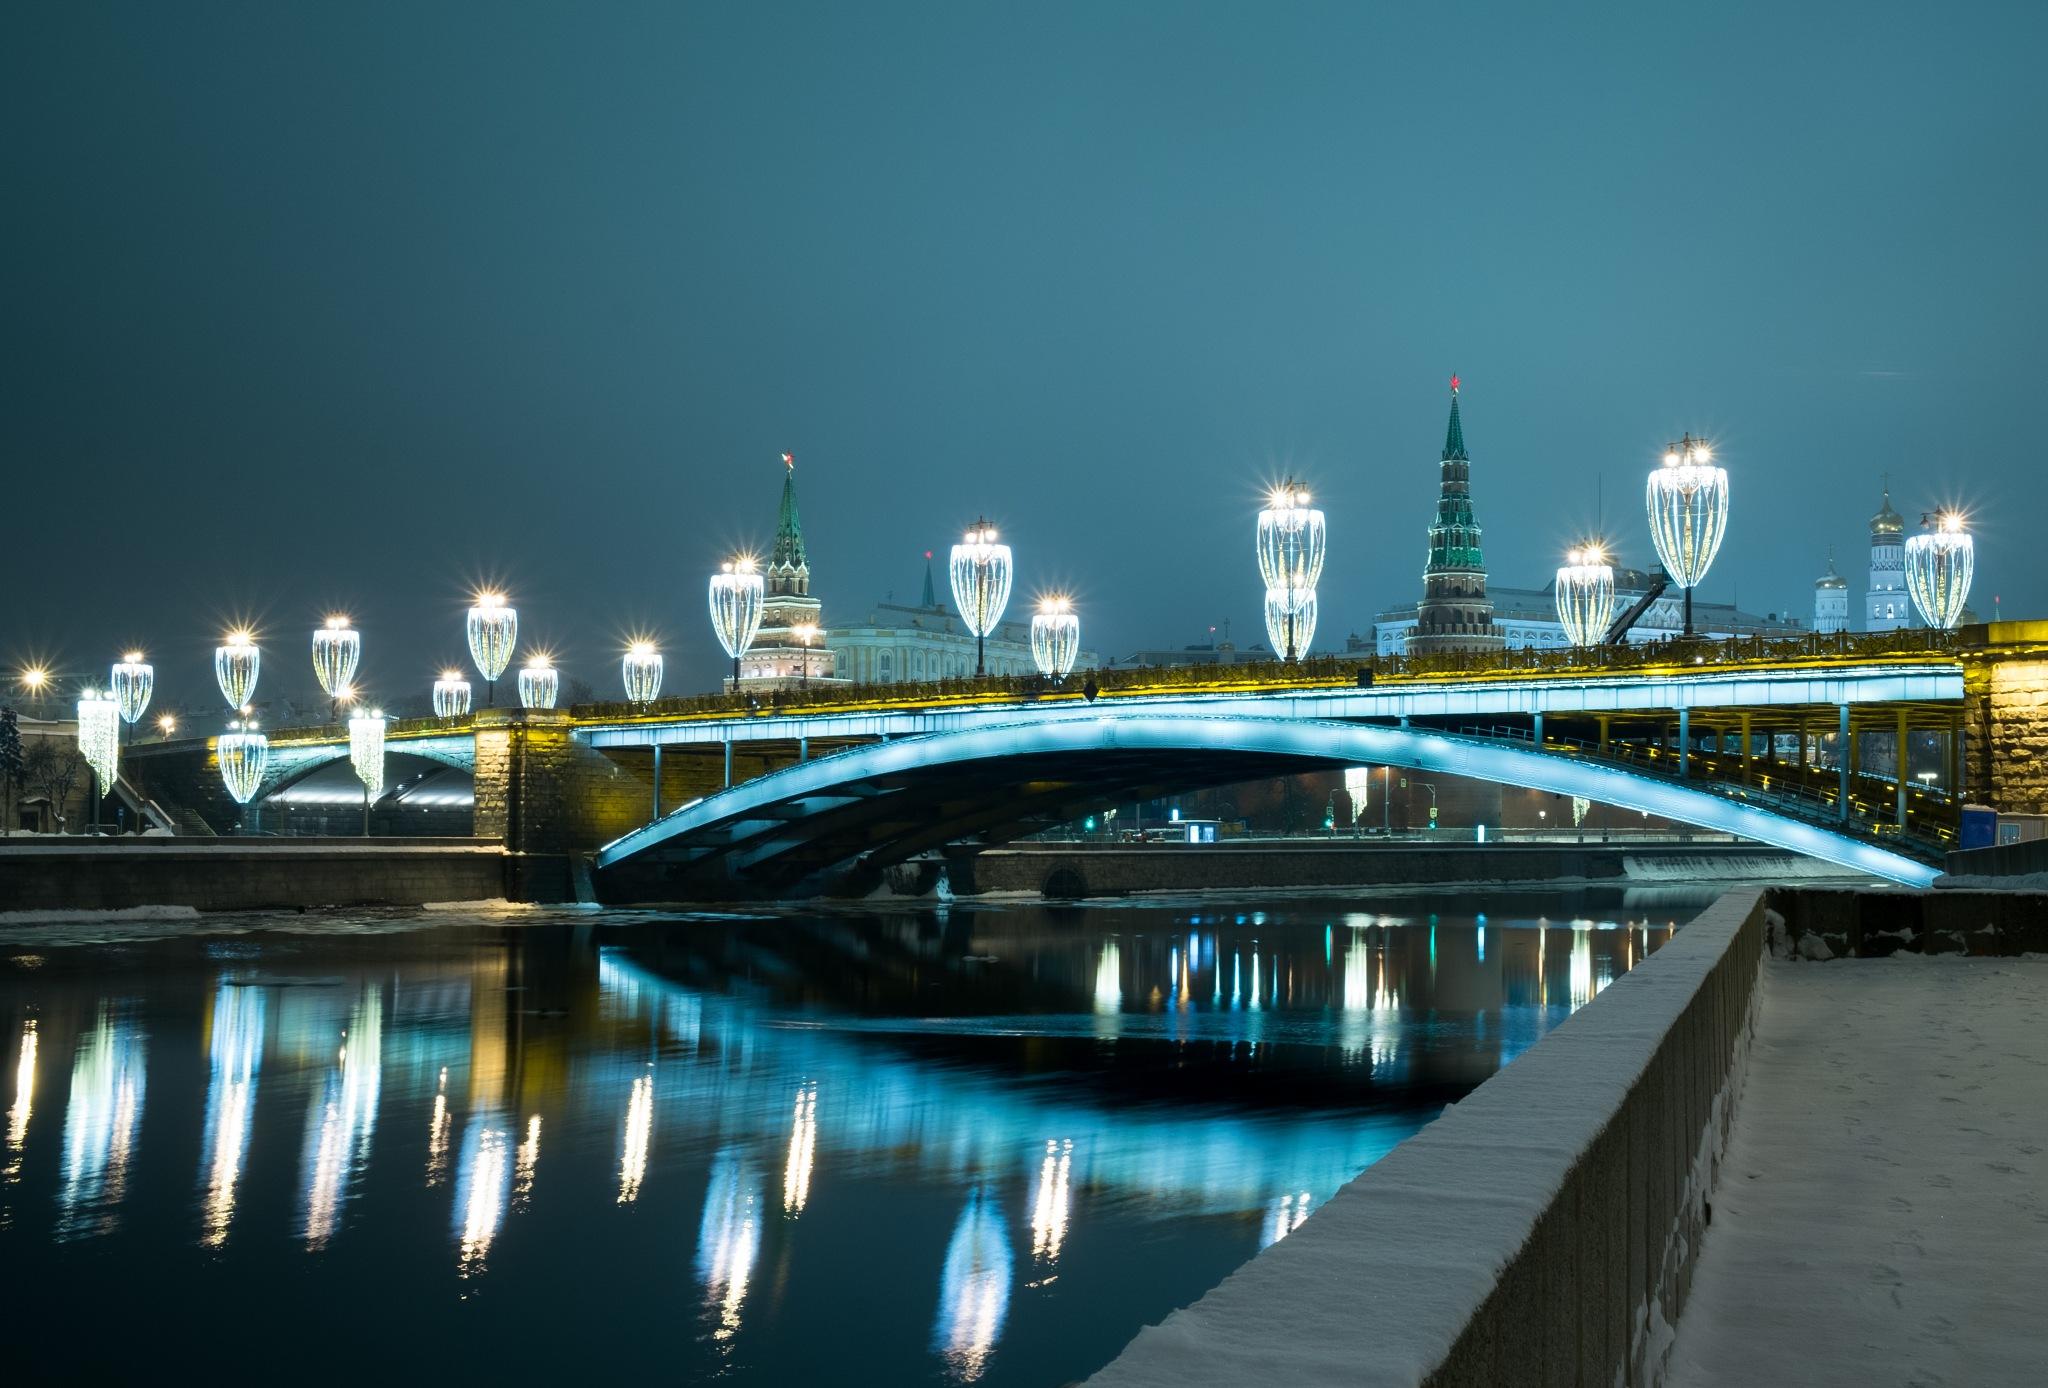 Night kremlin bridge by Jeka